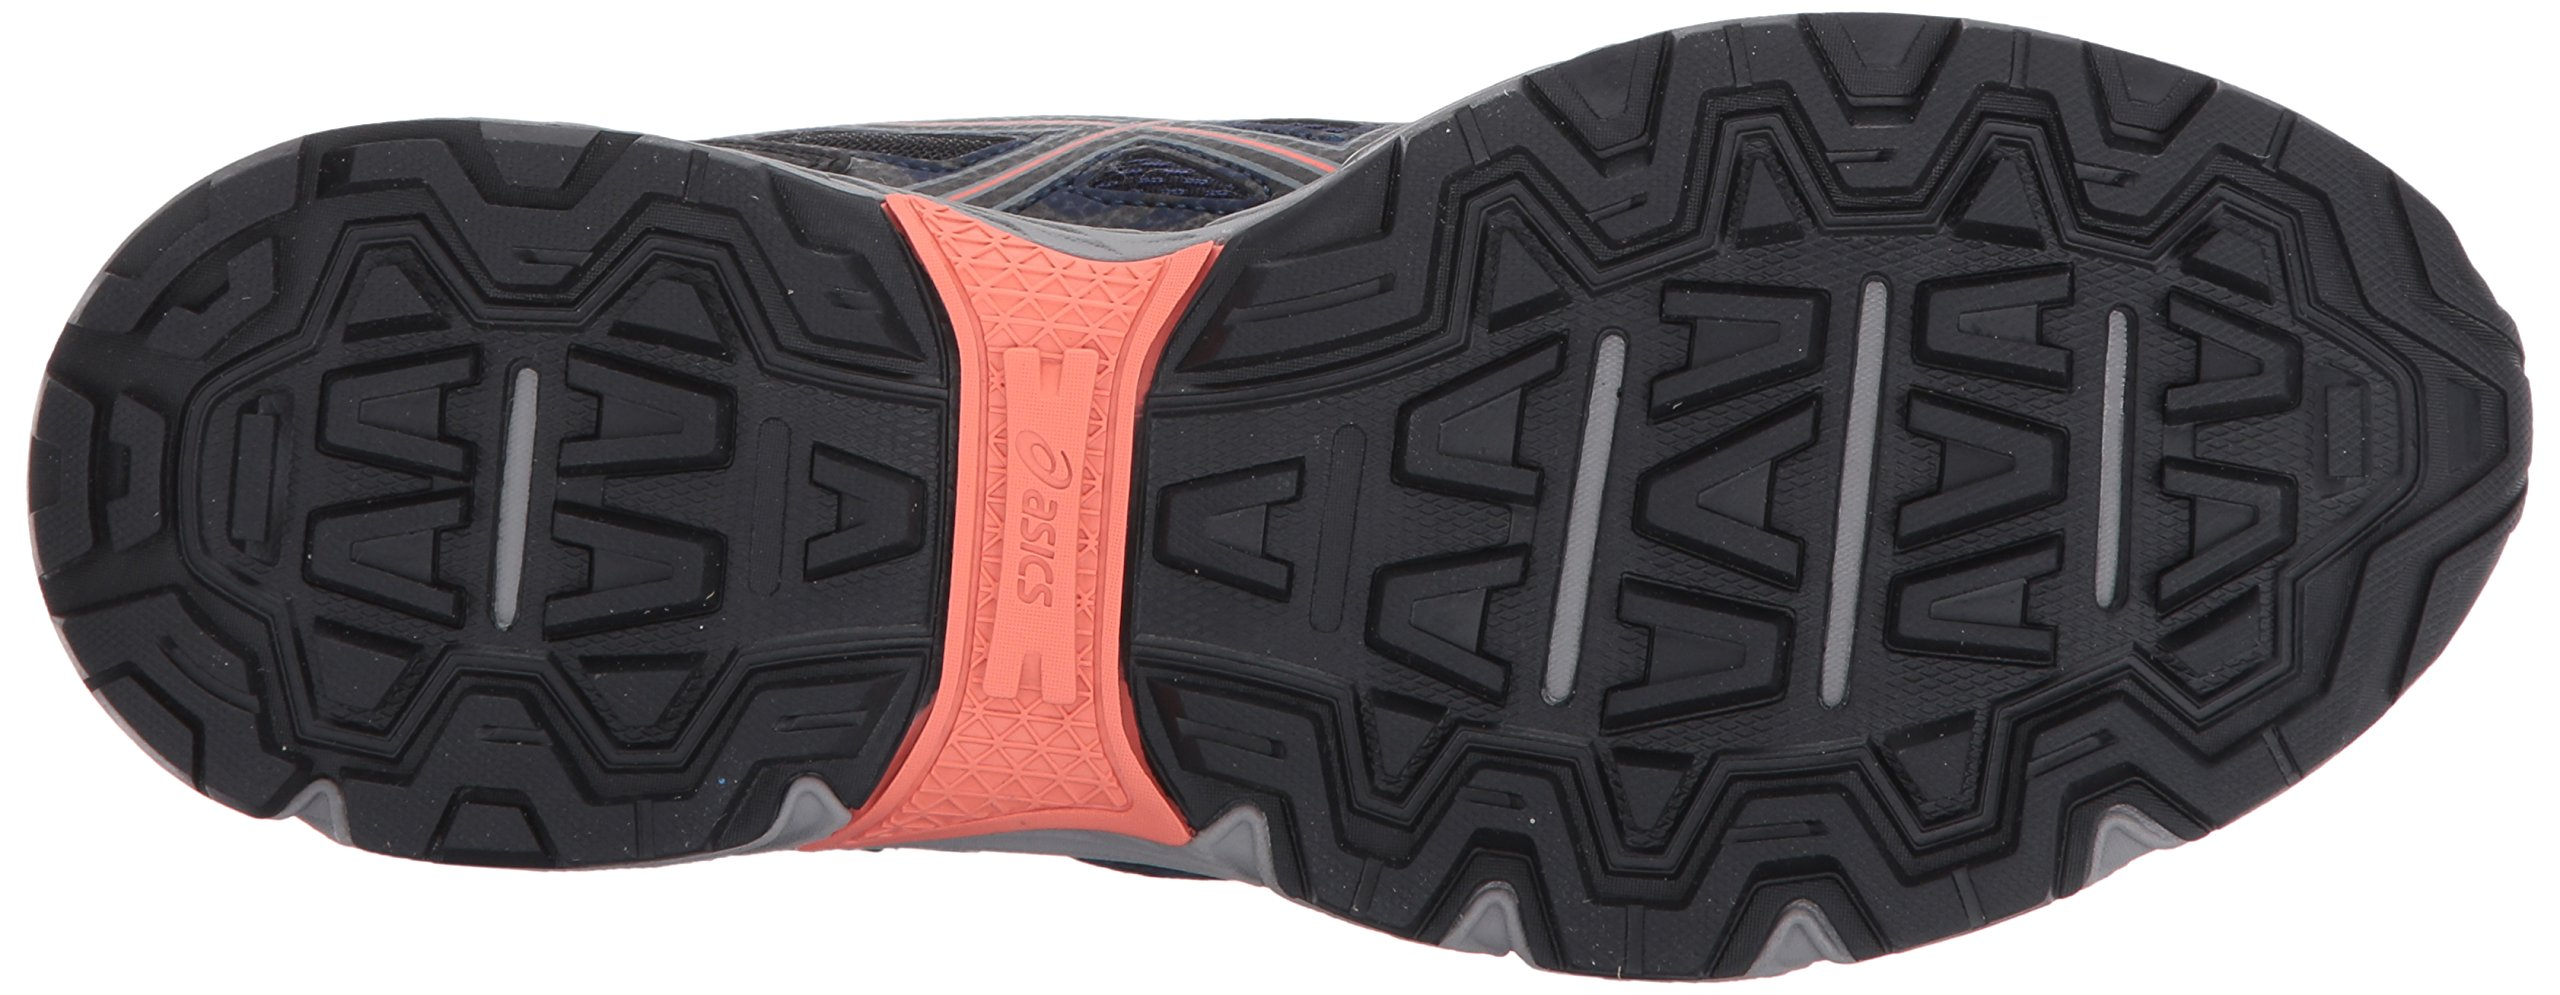 ASICS Women's Gel-Venture 6 Running-Shoes,Indigo Blue/Black/Coral,5 Medium US by ASICS (Image #3)